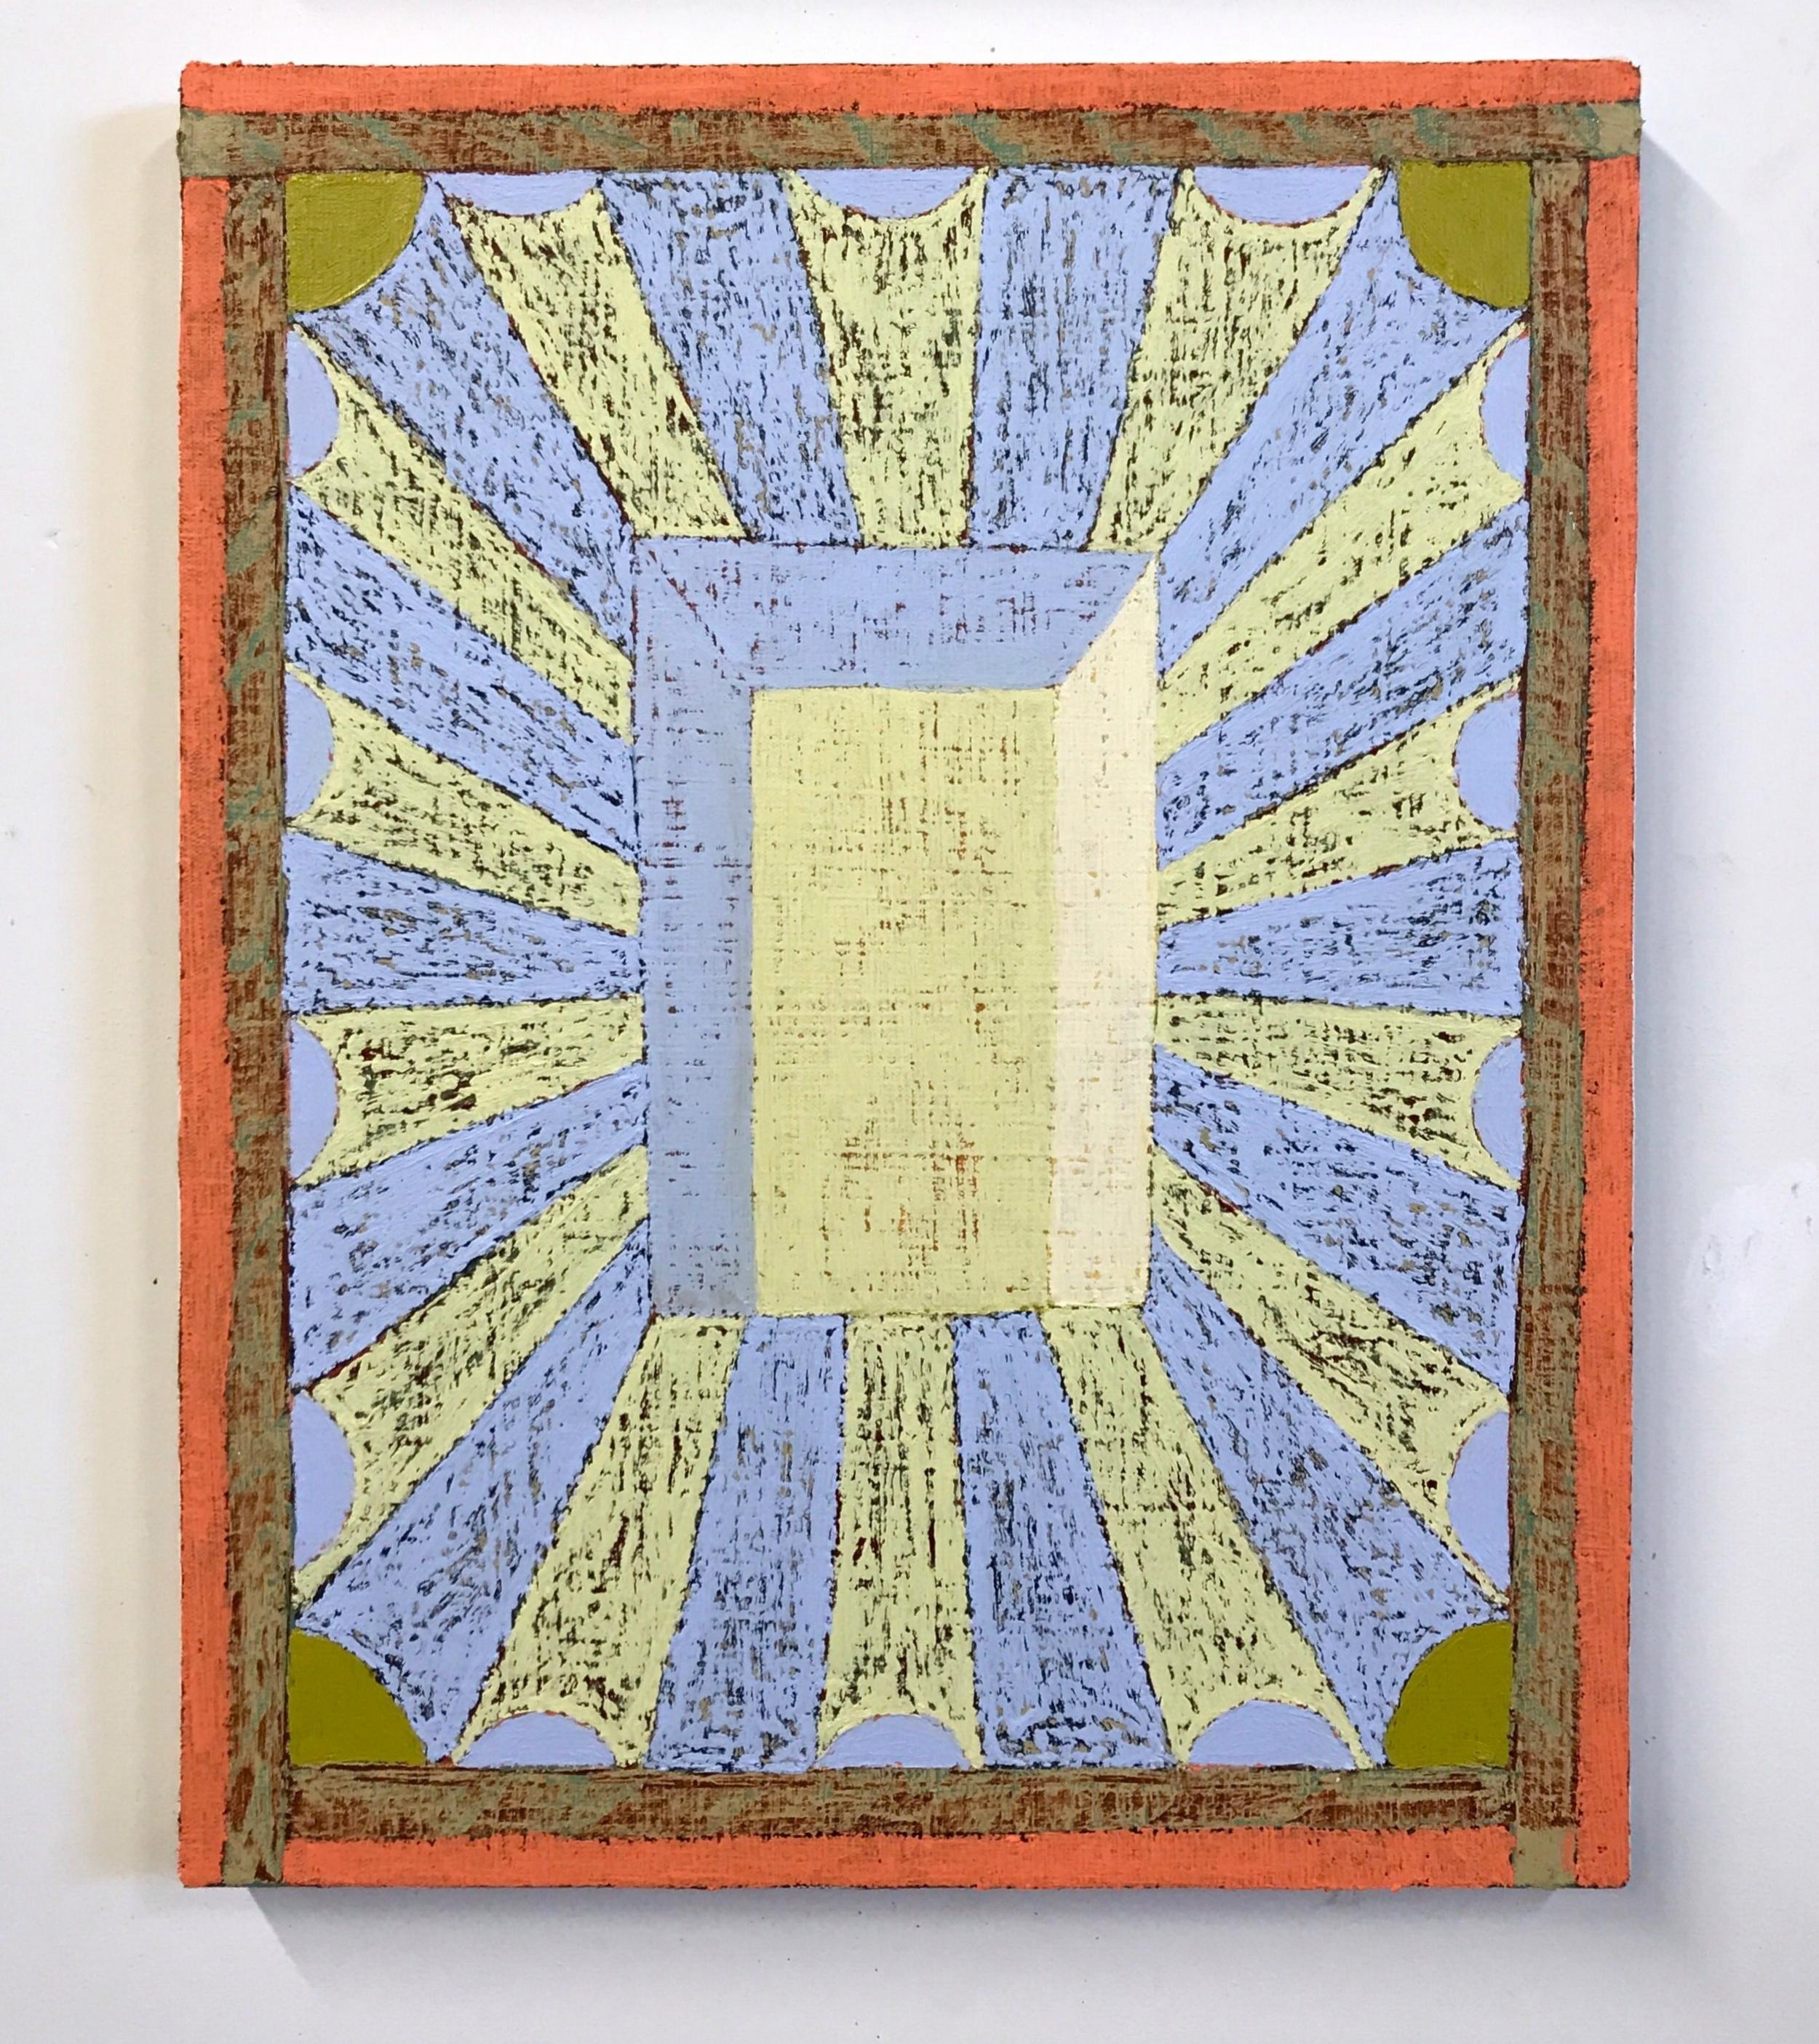 Matt Kleberg,Pale Hiss,2017,oil stick on canvas,20 x 16 inches